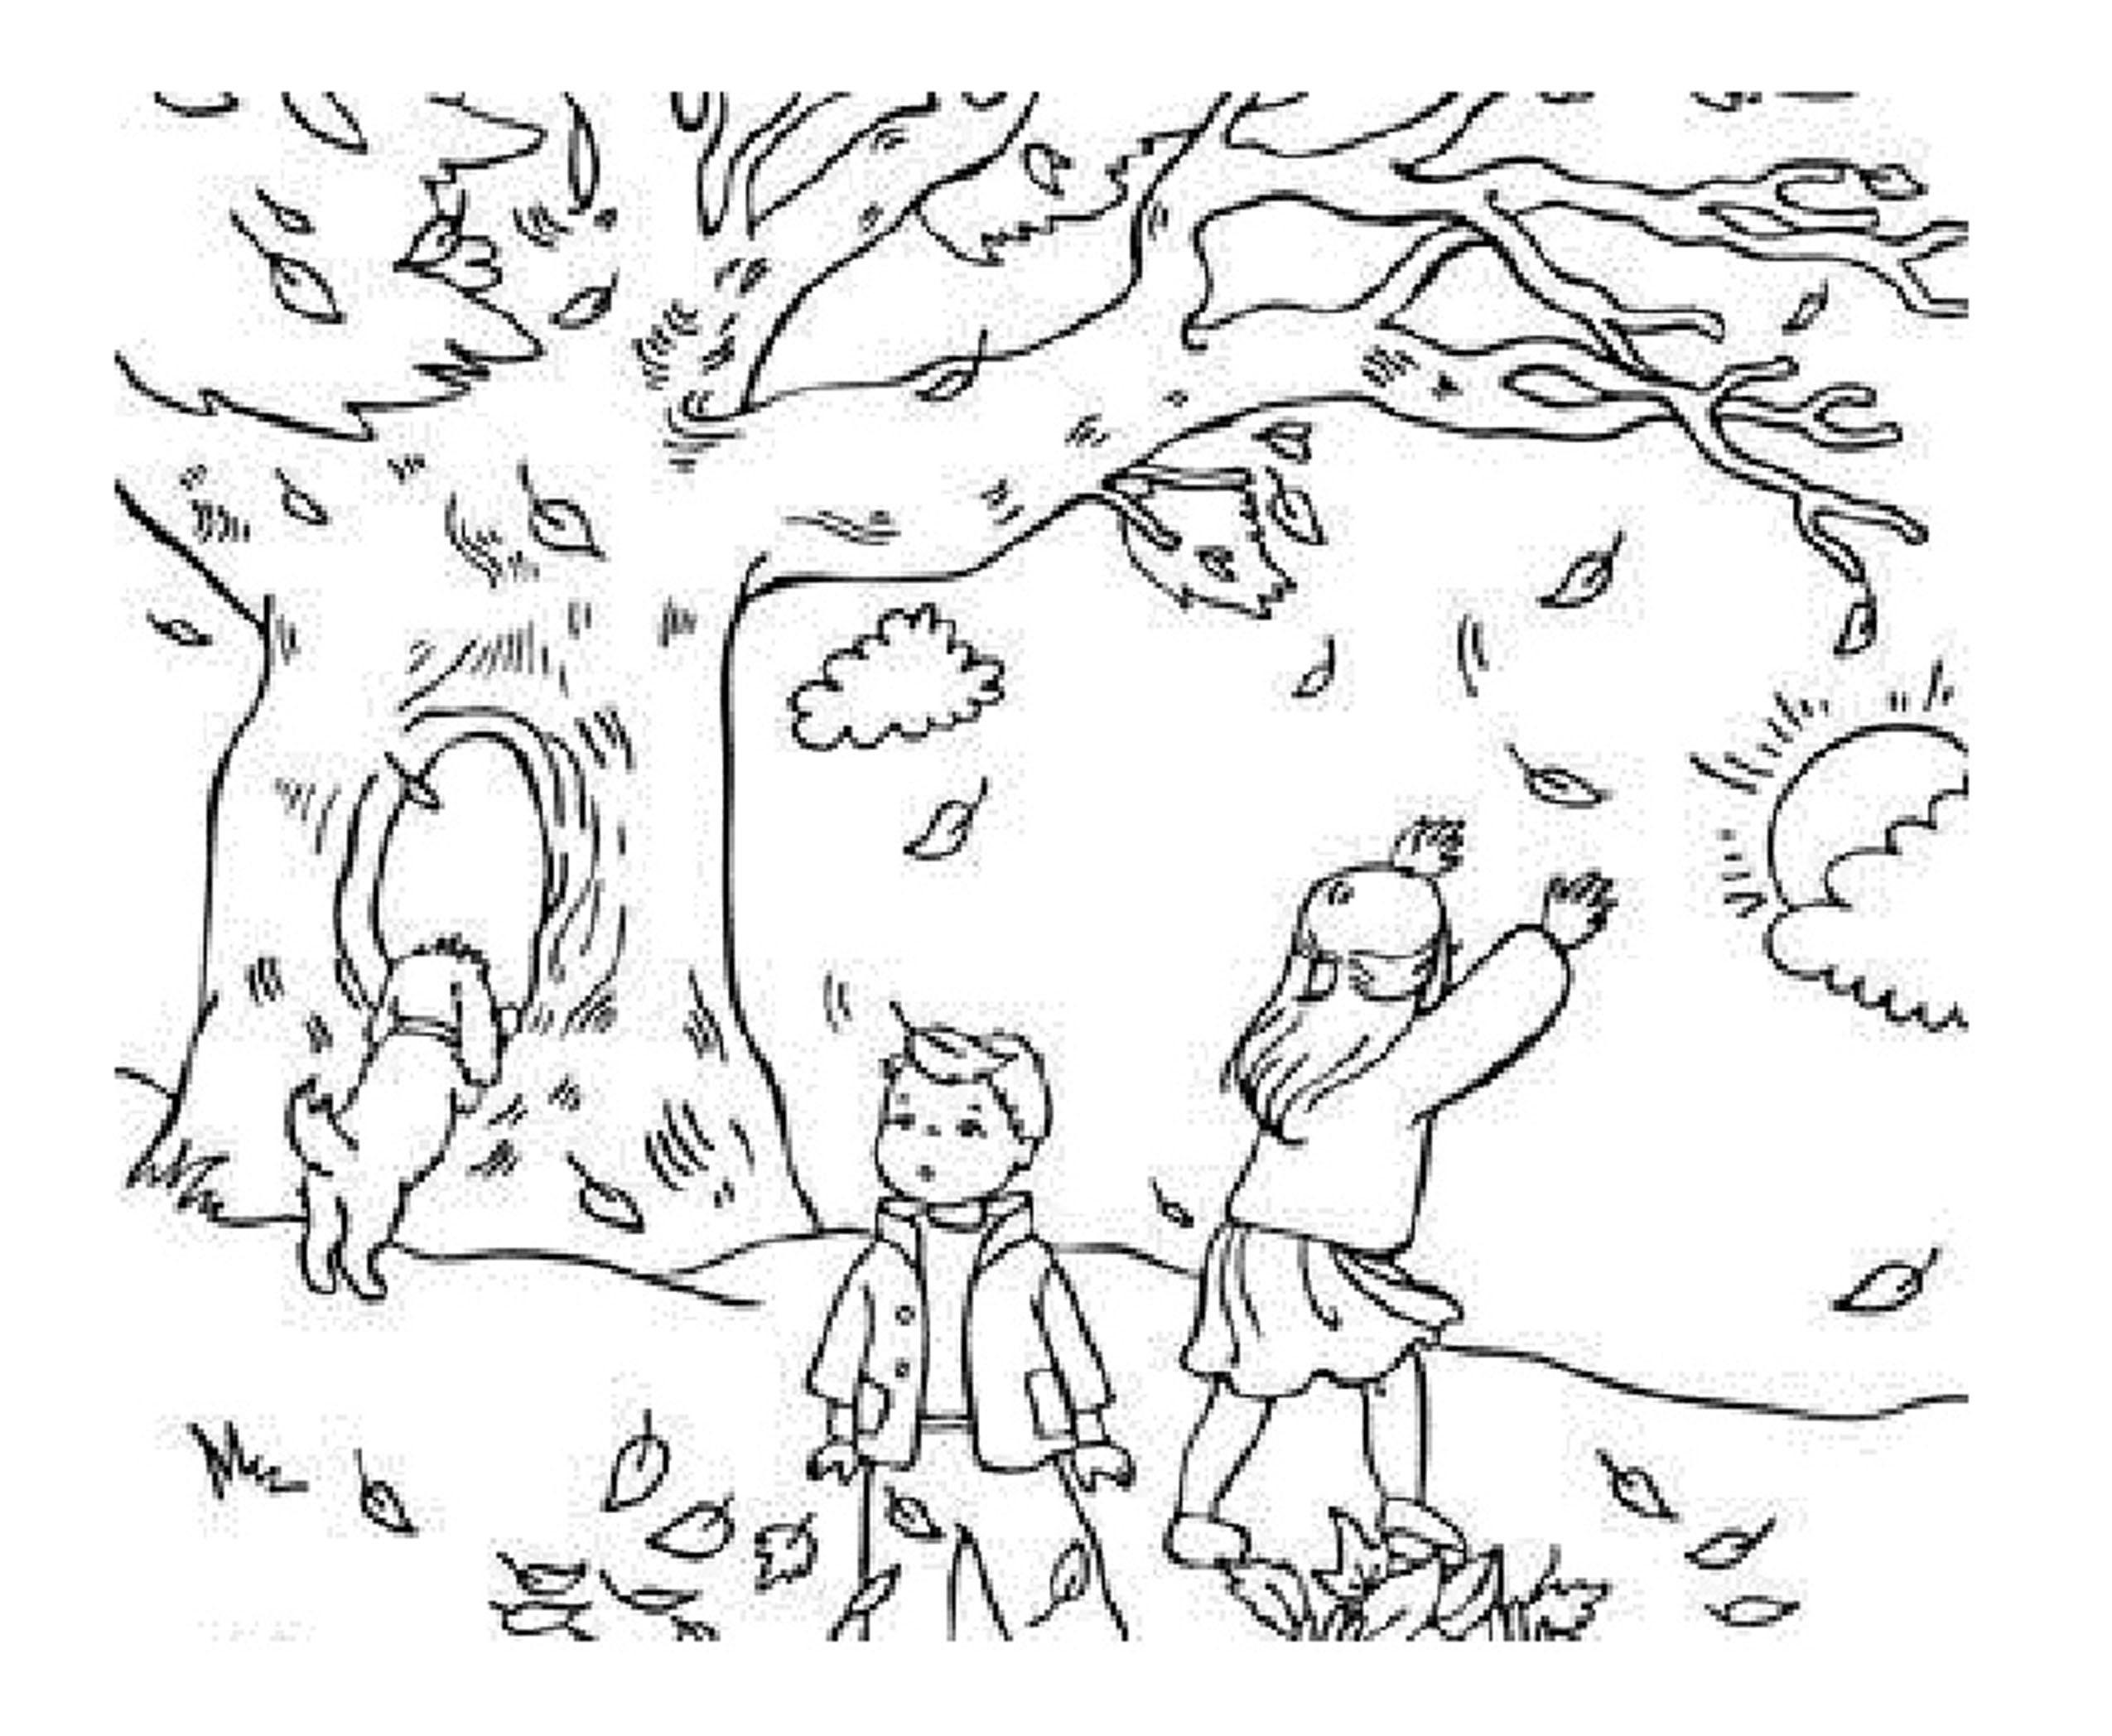 Four Seasons Colouring Page | Seasons worksheets, Seasons lessons ... | 2096x2550